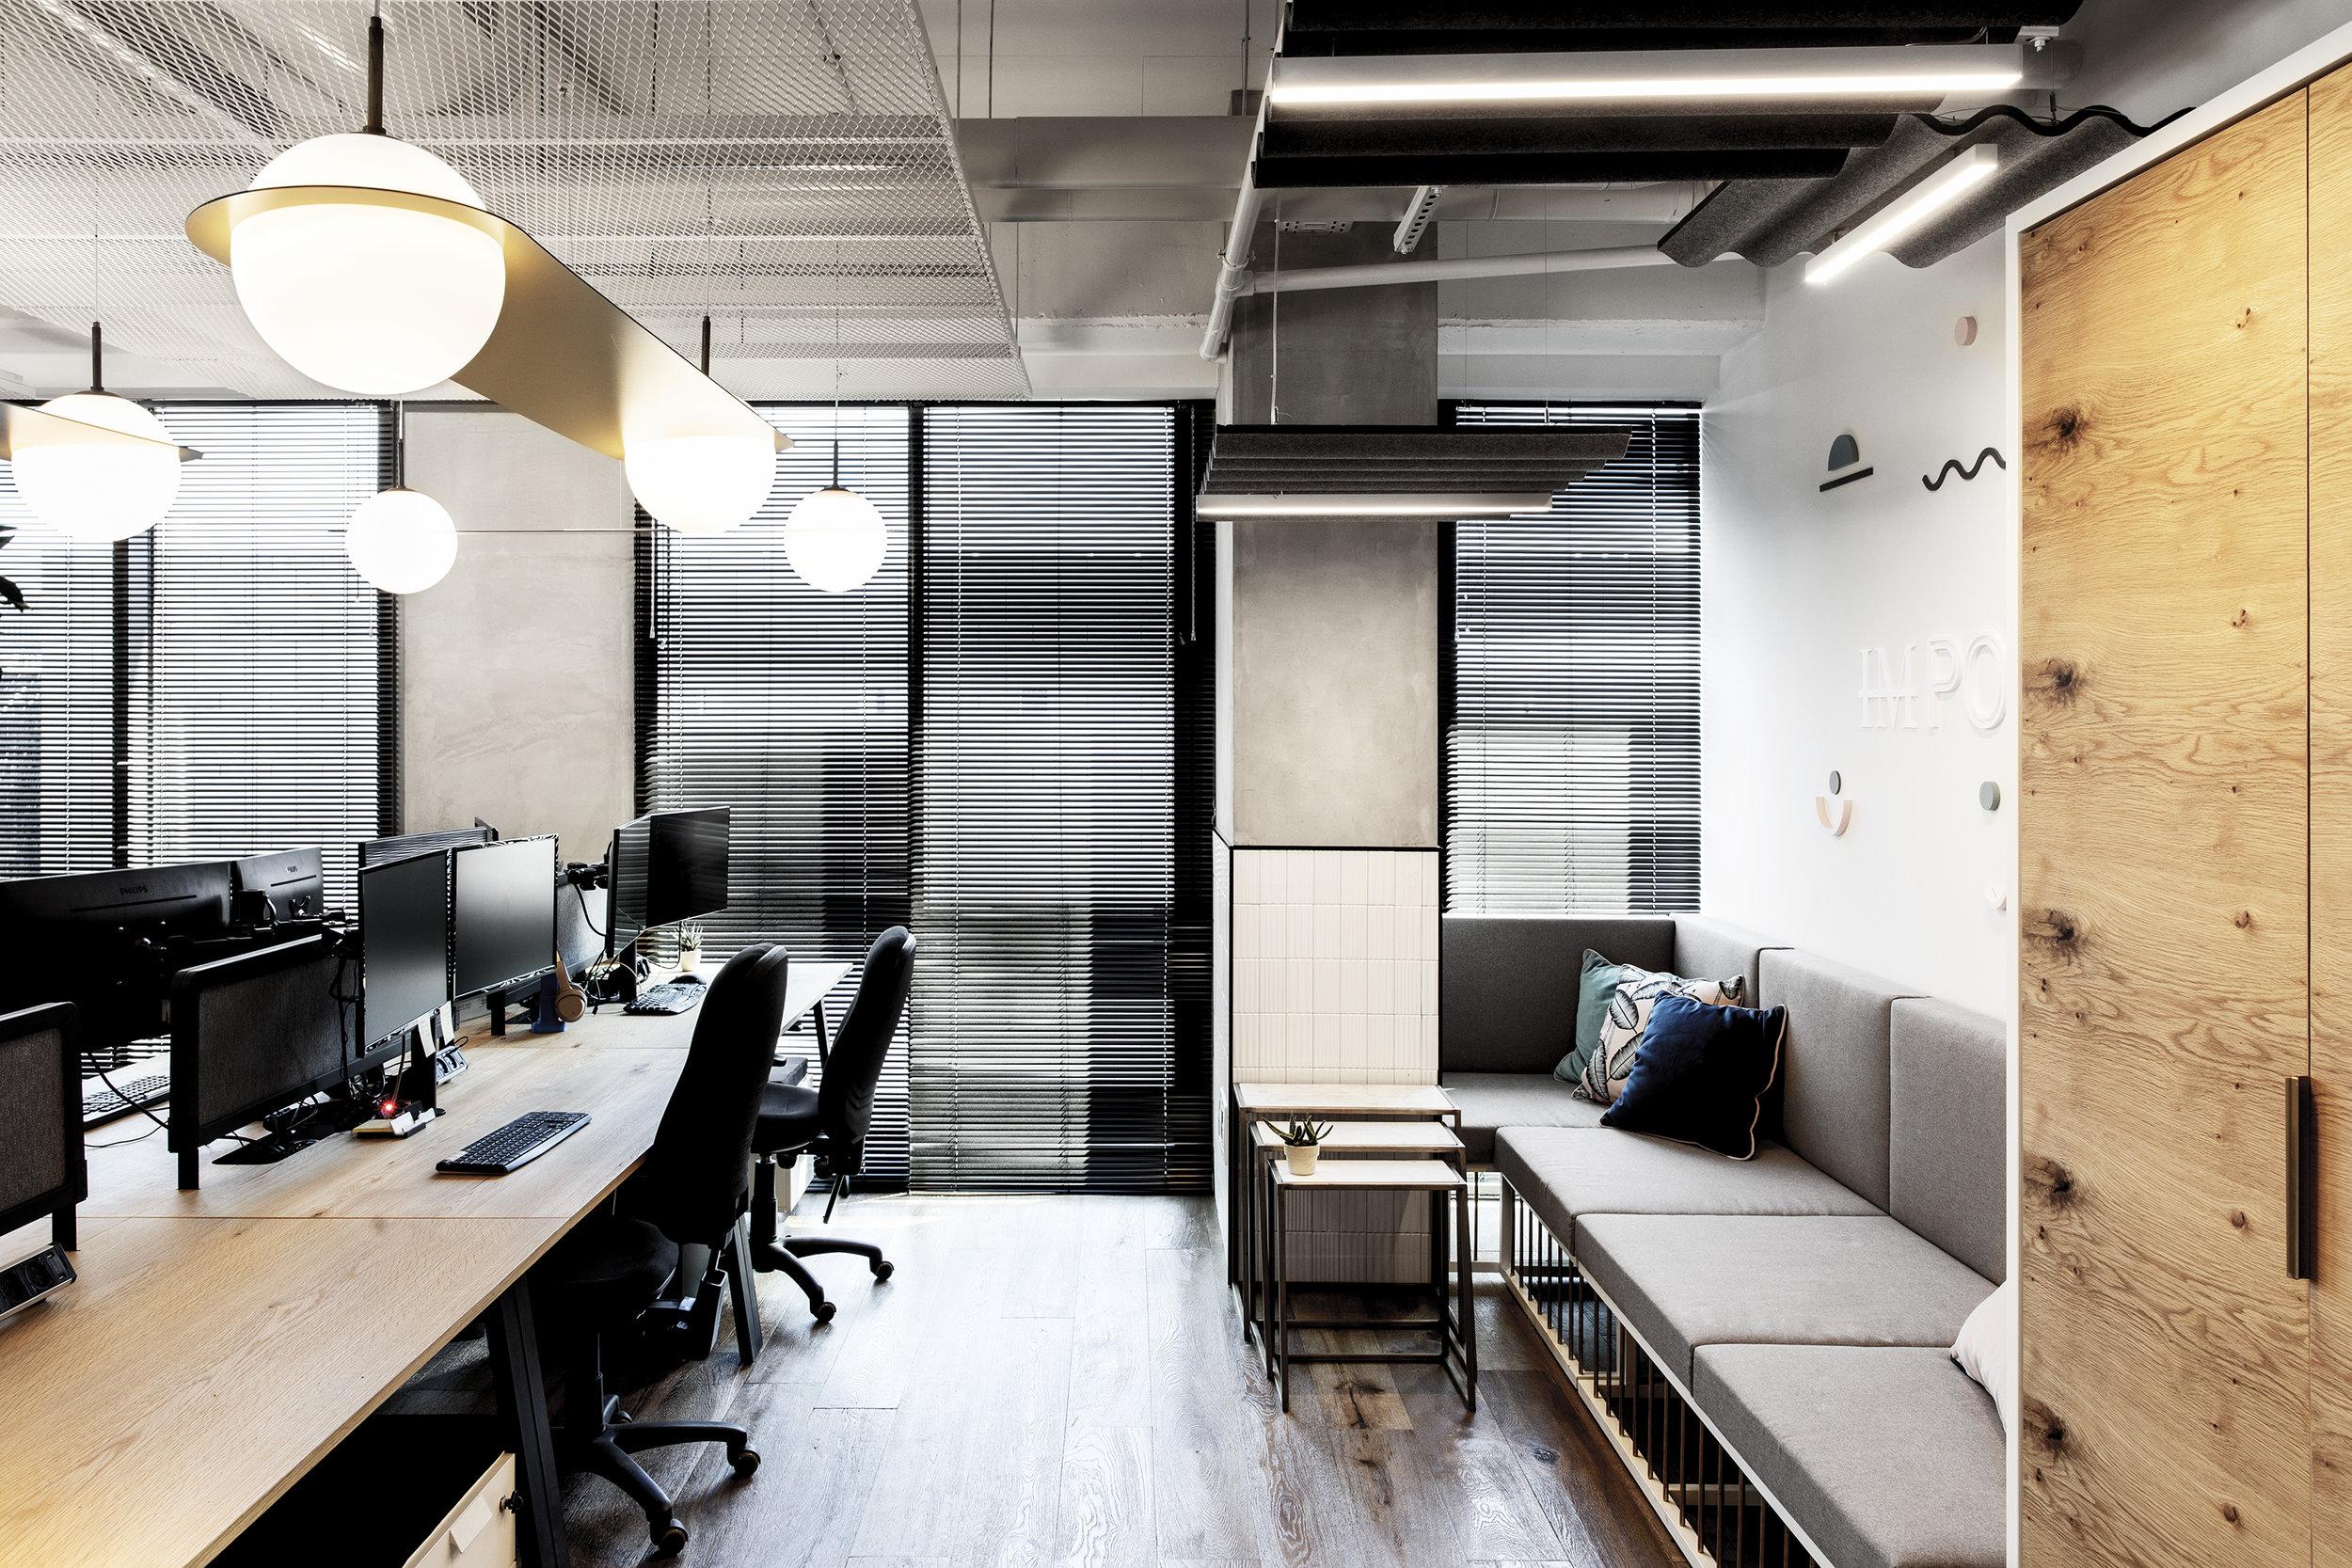 R2NET OFFICES - ROY DAVID ARCHITECTURE  STUDIO - רואי דוד אדריכלות סטודיו אדריכלים - אר2נט (17).jpg